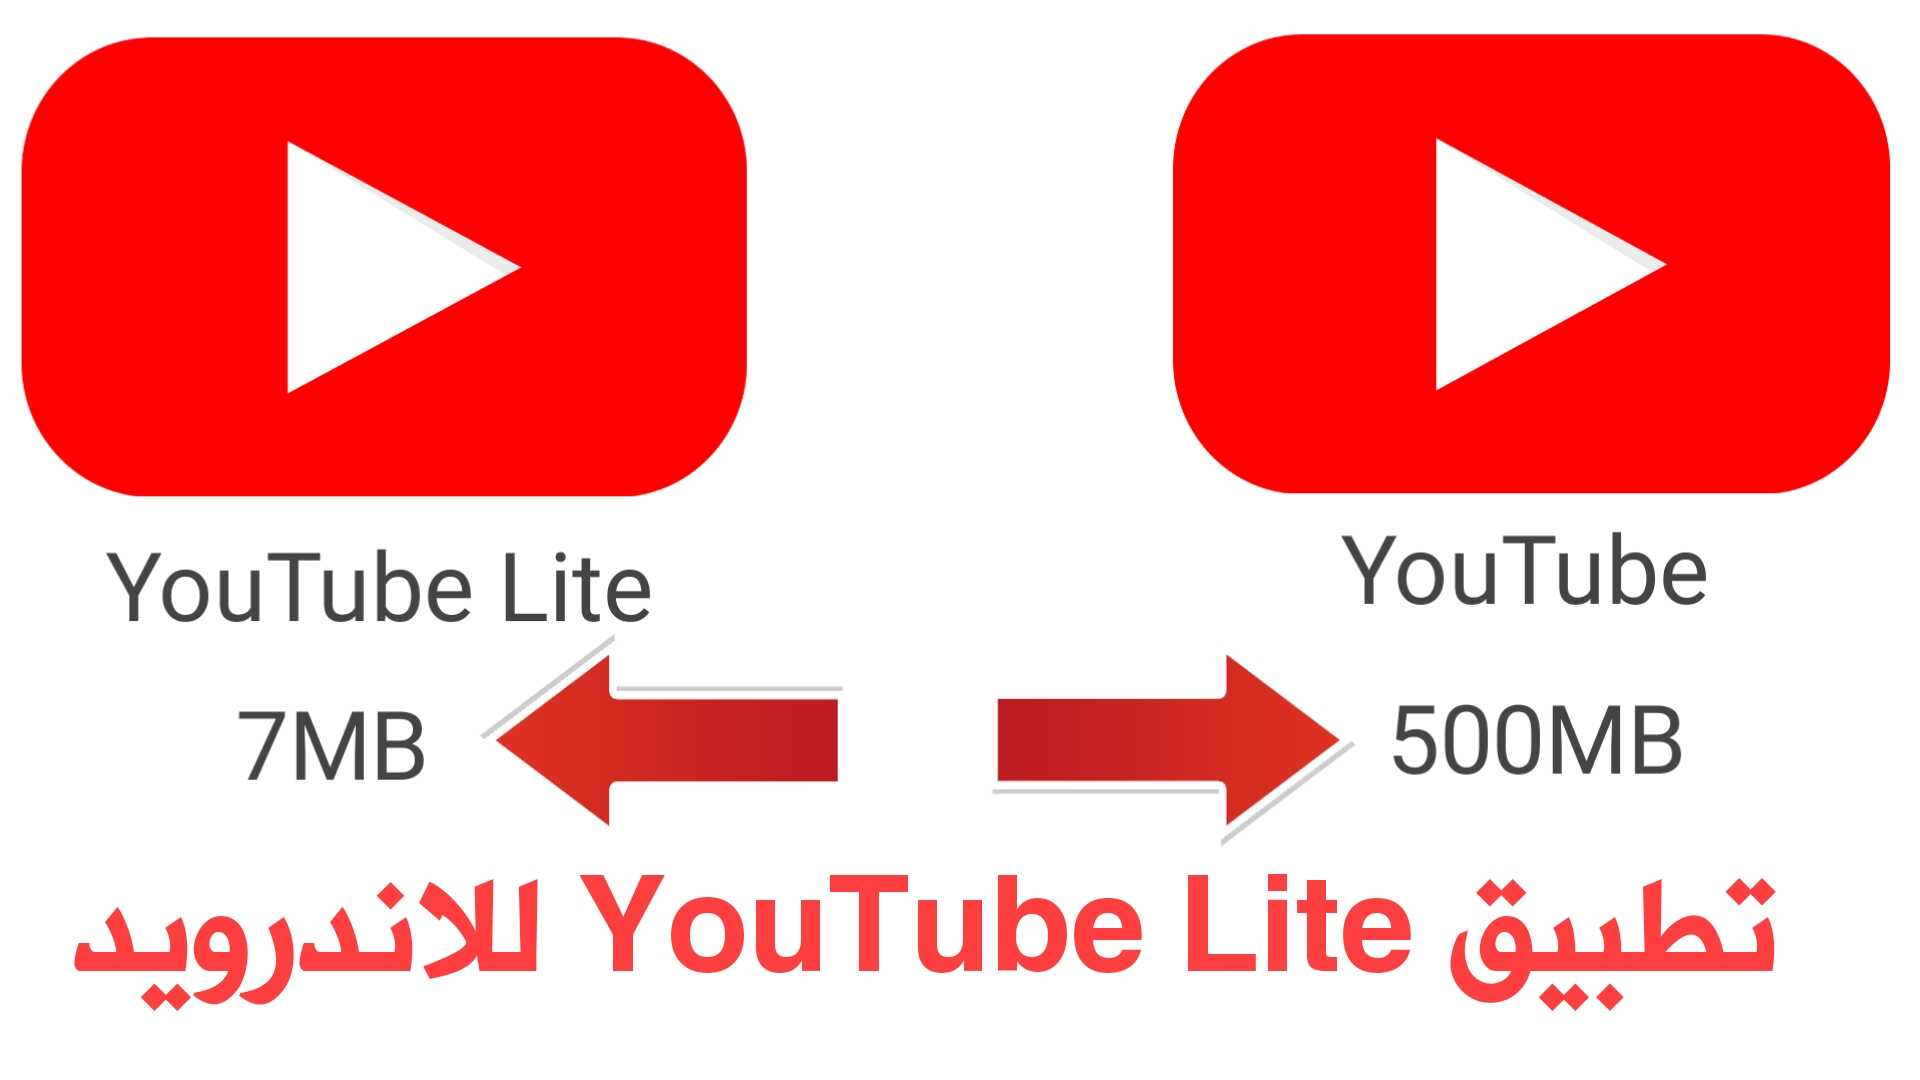 تطبيق YouTube Lite للاندرويد يوتيوب بدون أعلانات